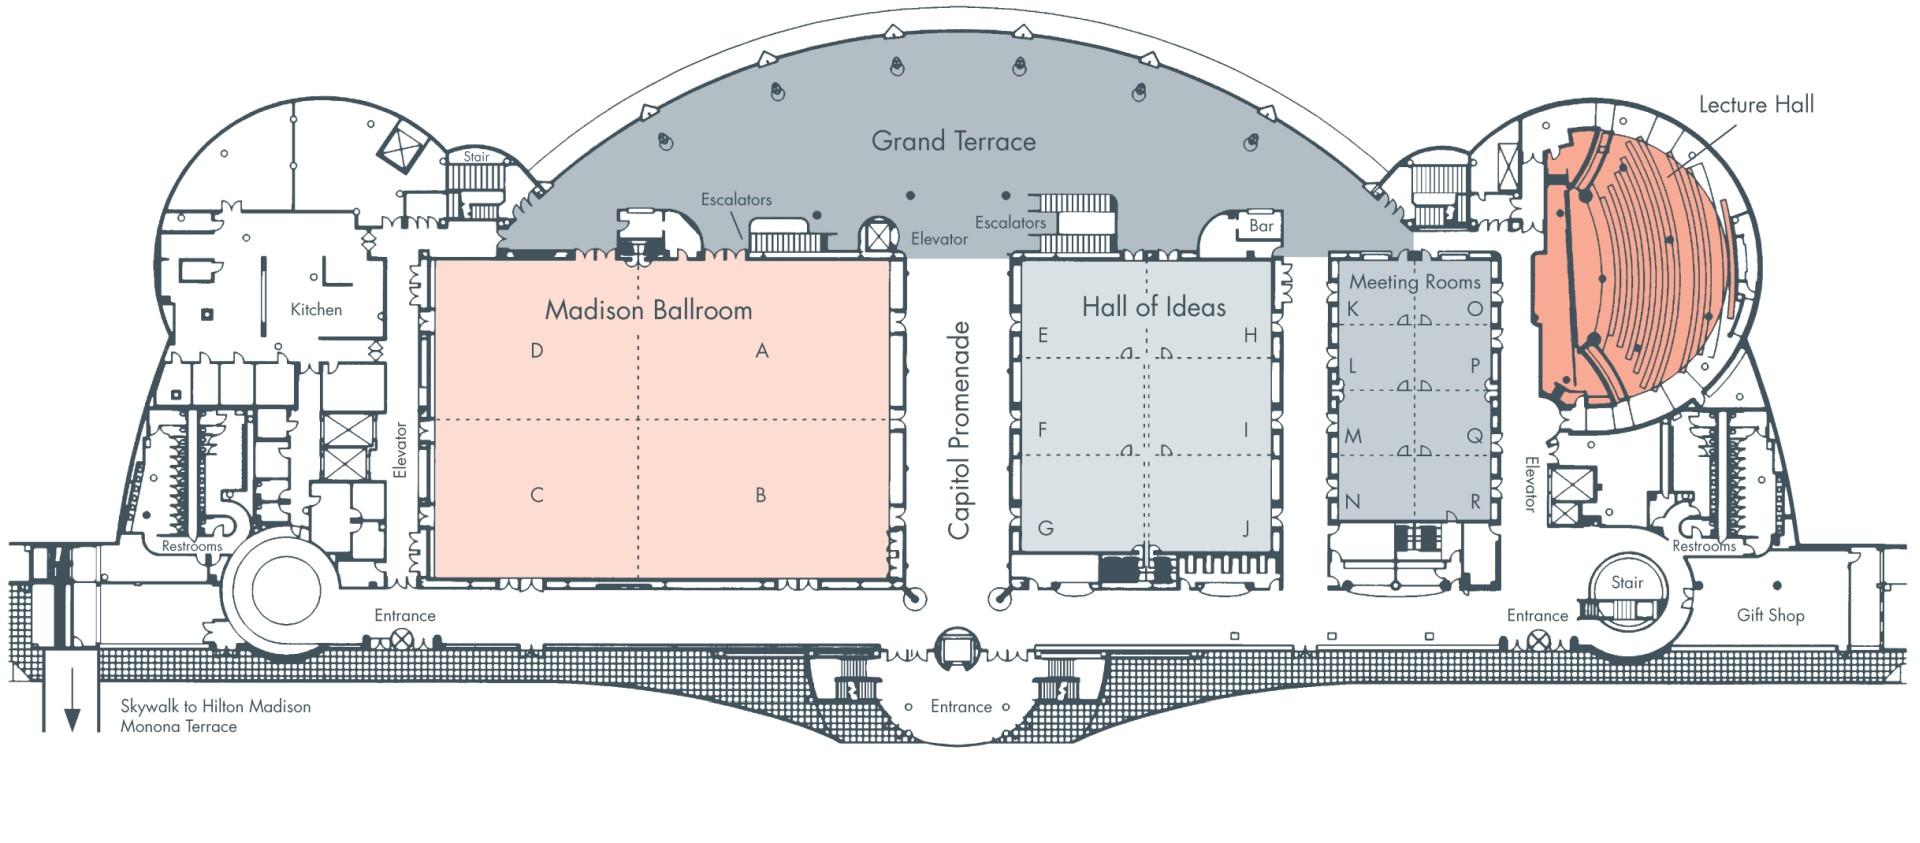 Level 4 floorplan